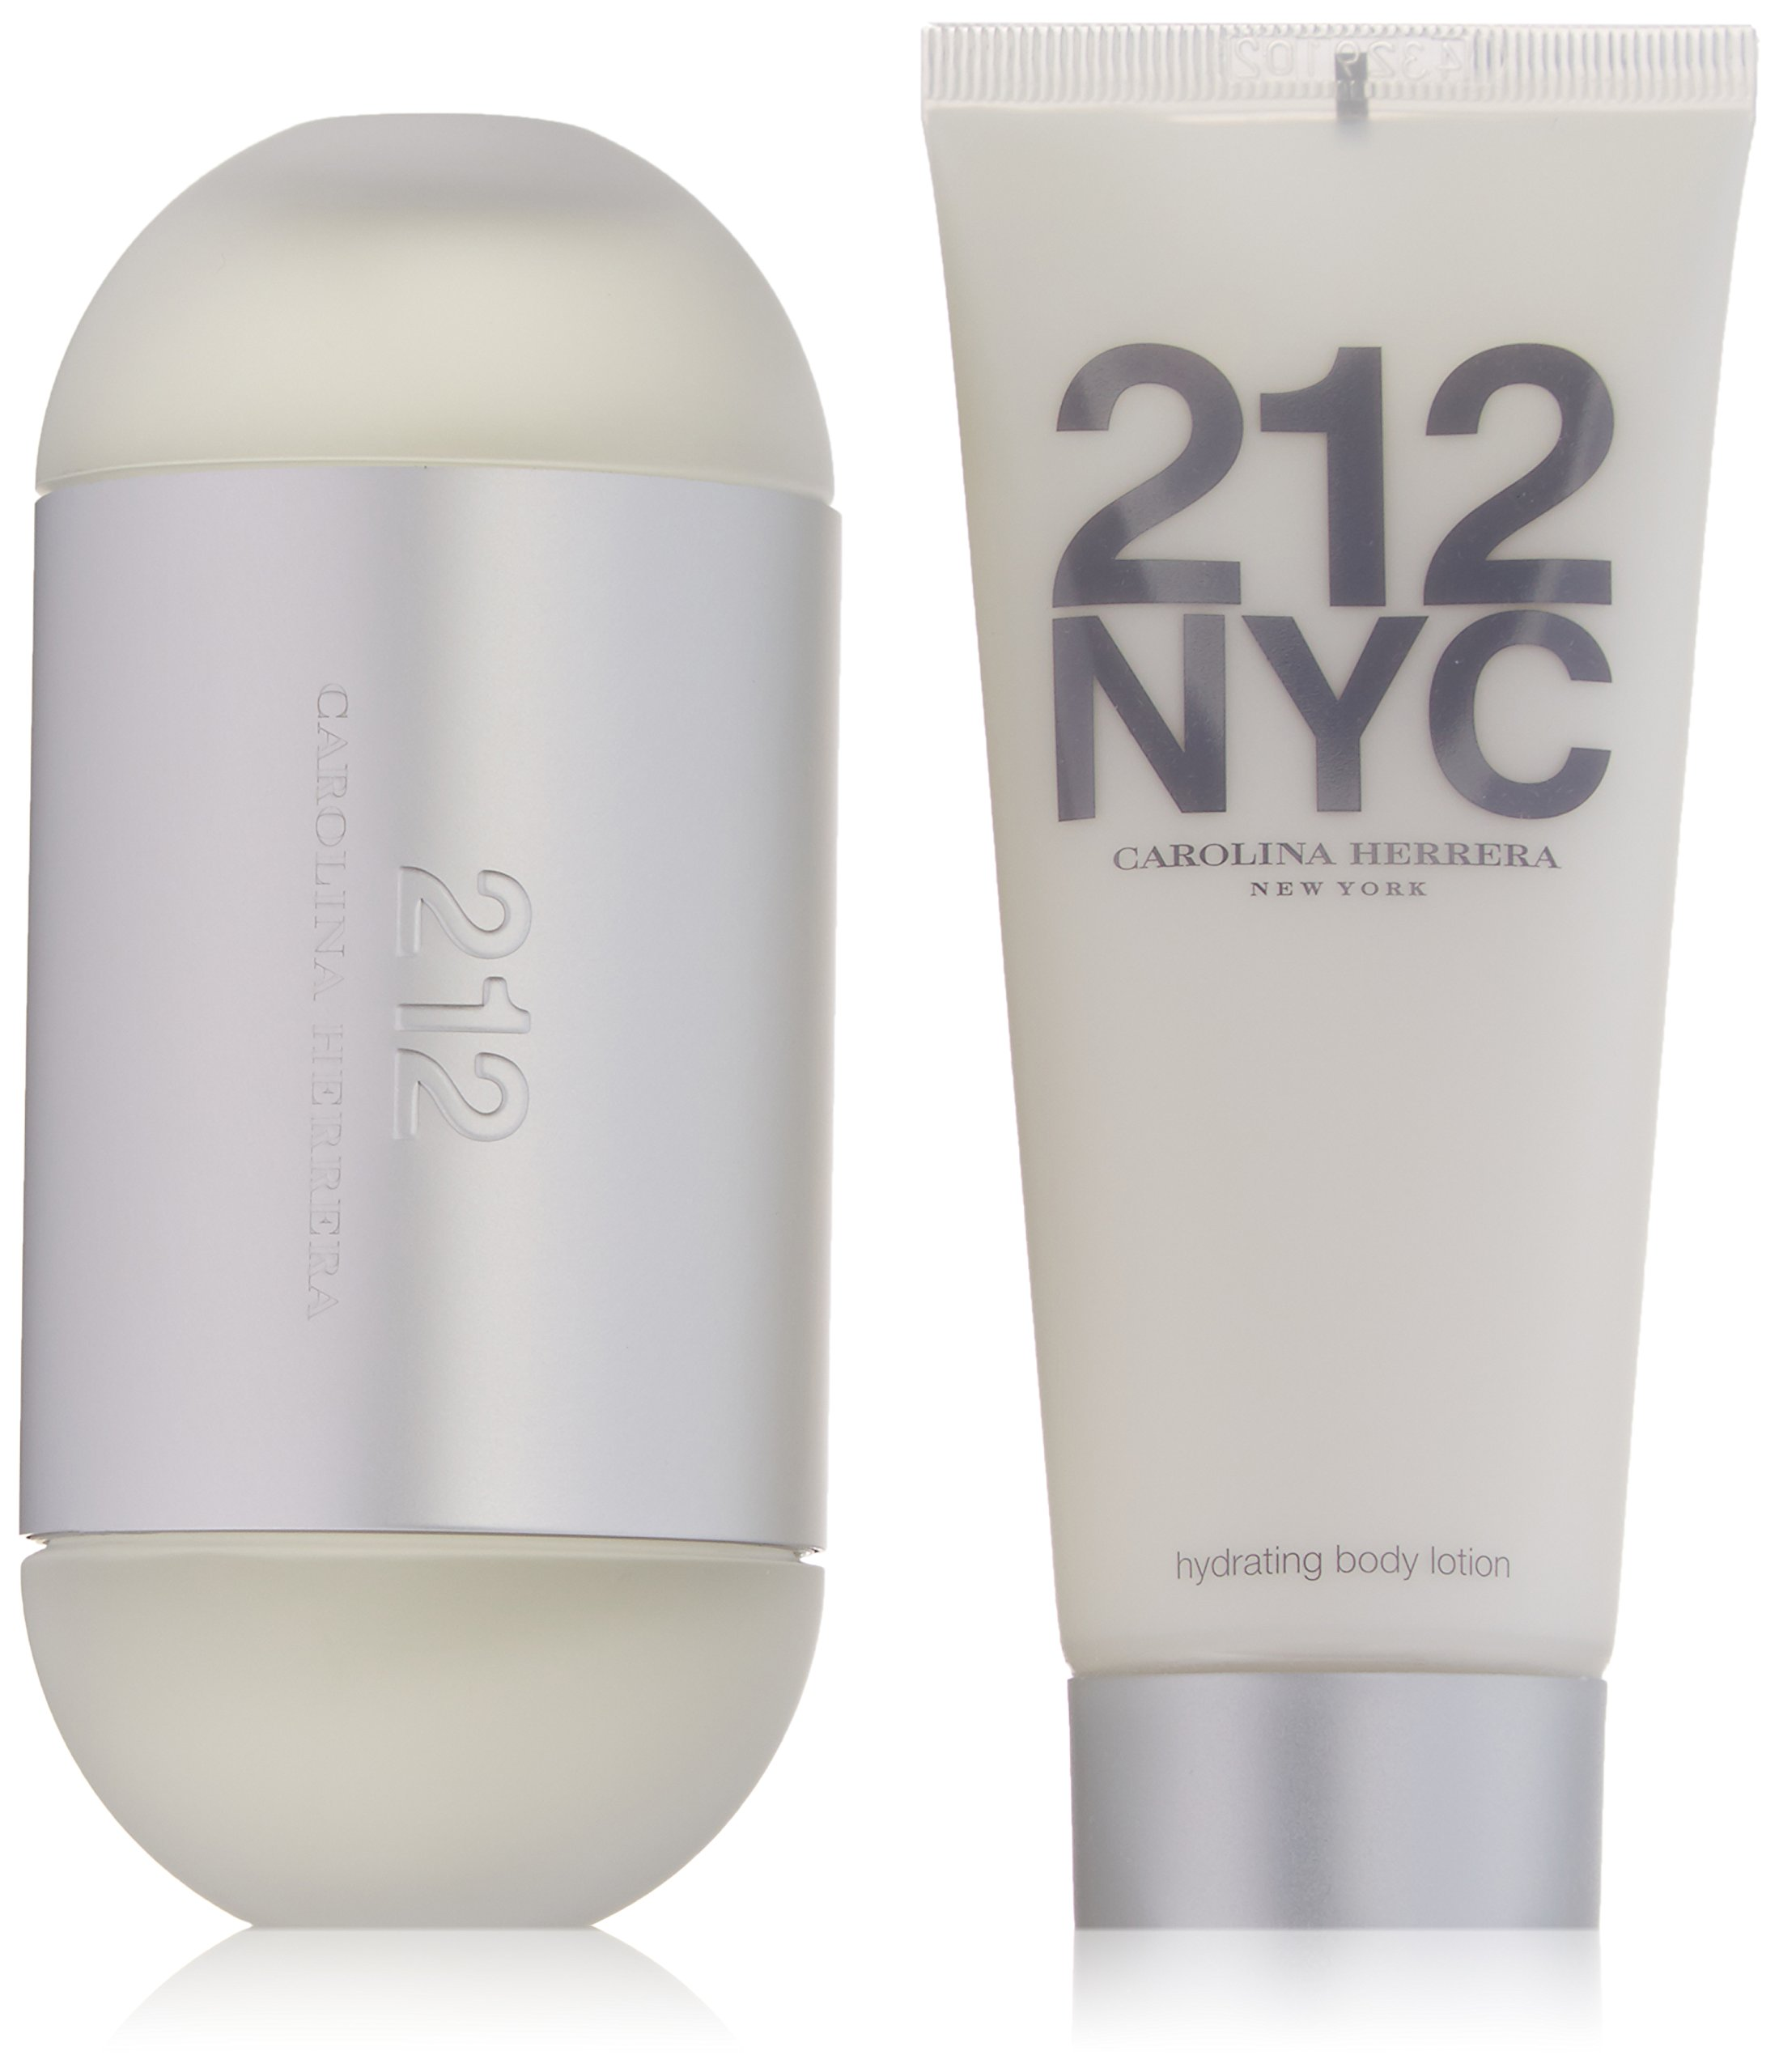 Carolina Herrera 212 For Women 2 Piece Set (3.4 Ounce Eau De Toilette Spray+ 3.4 Ounce Hydrating Body Lotion)